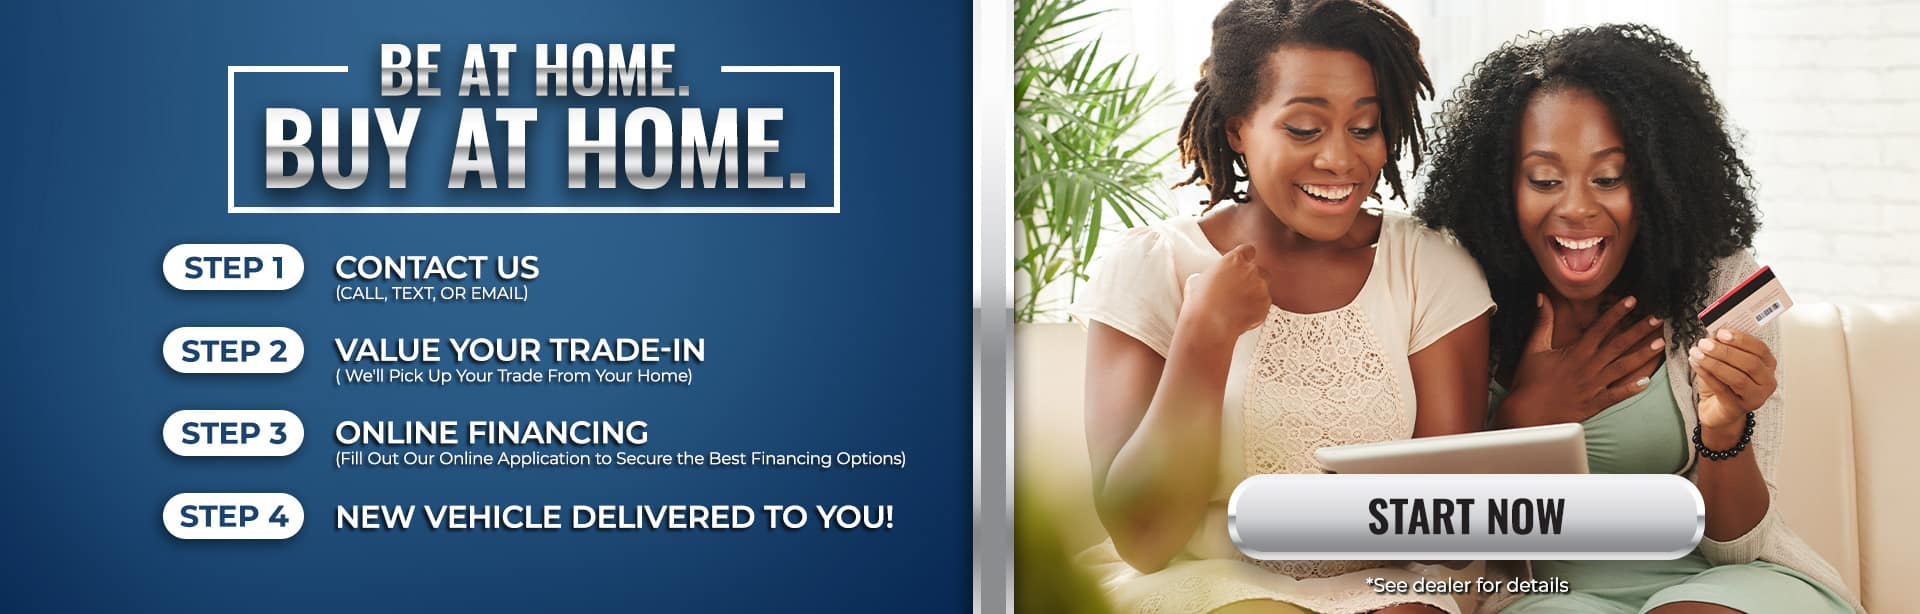 slide-buy at home-hyundia-ed volyes-smyrna-april15